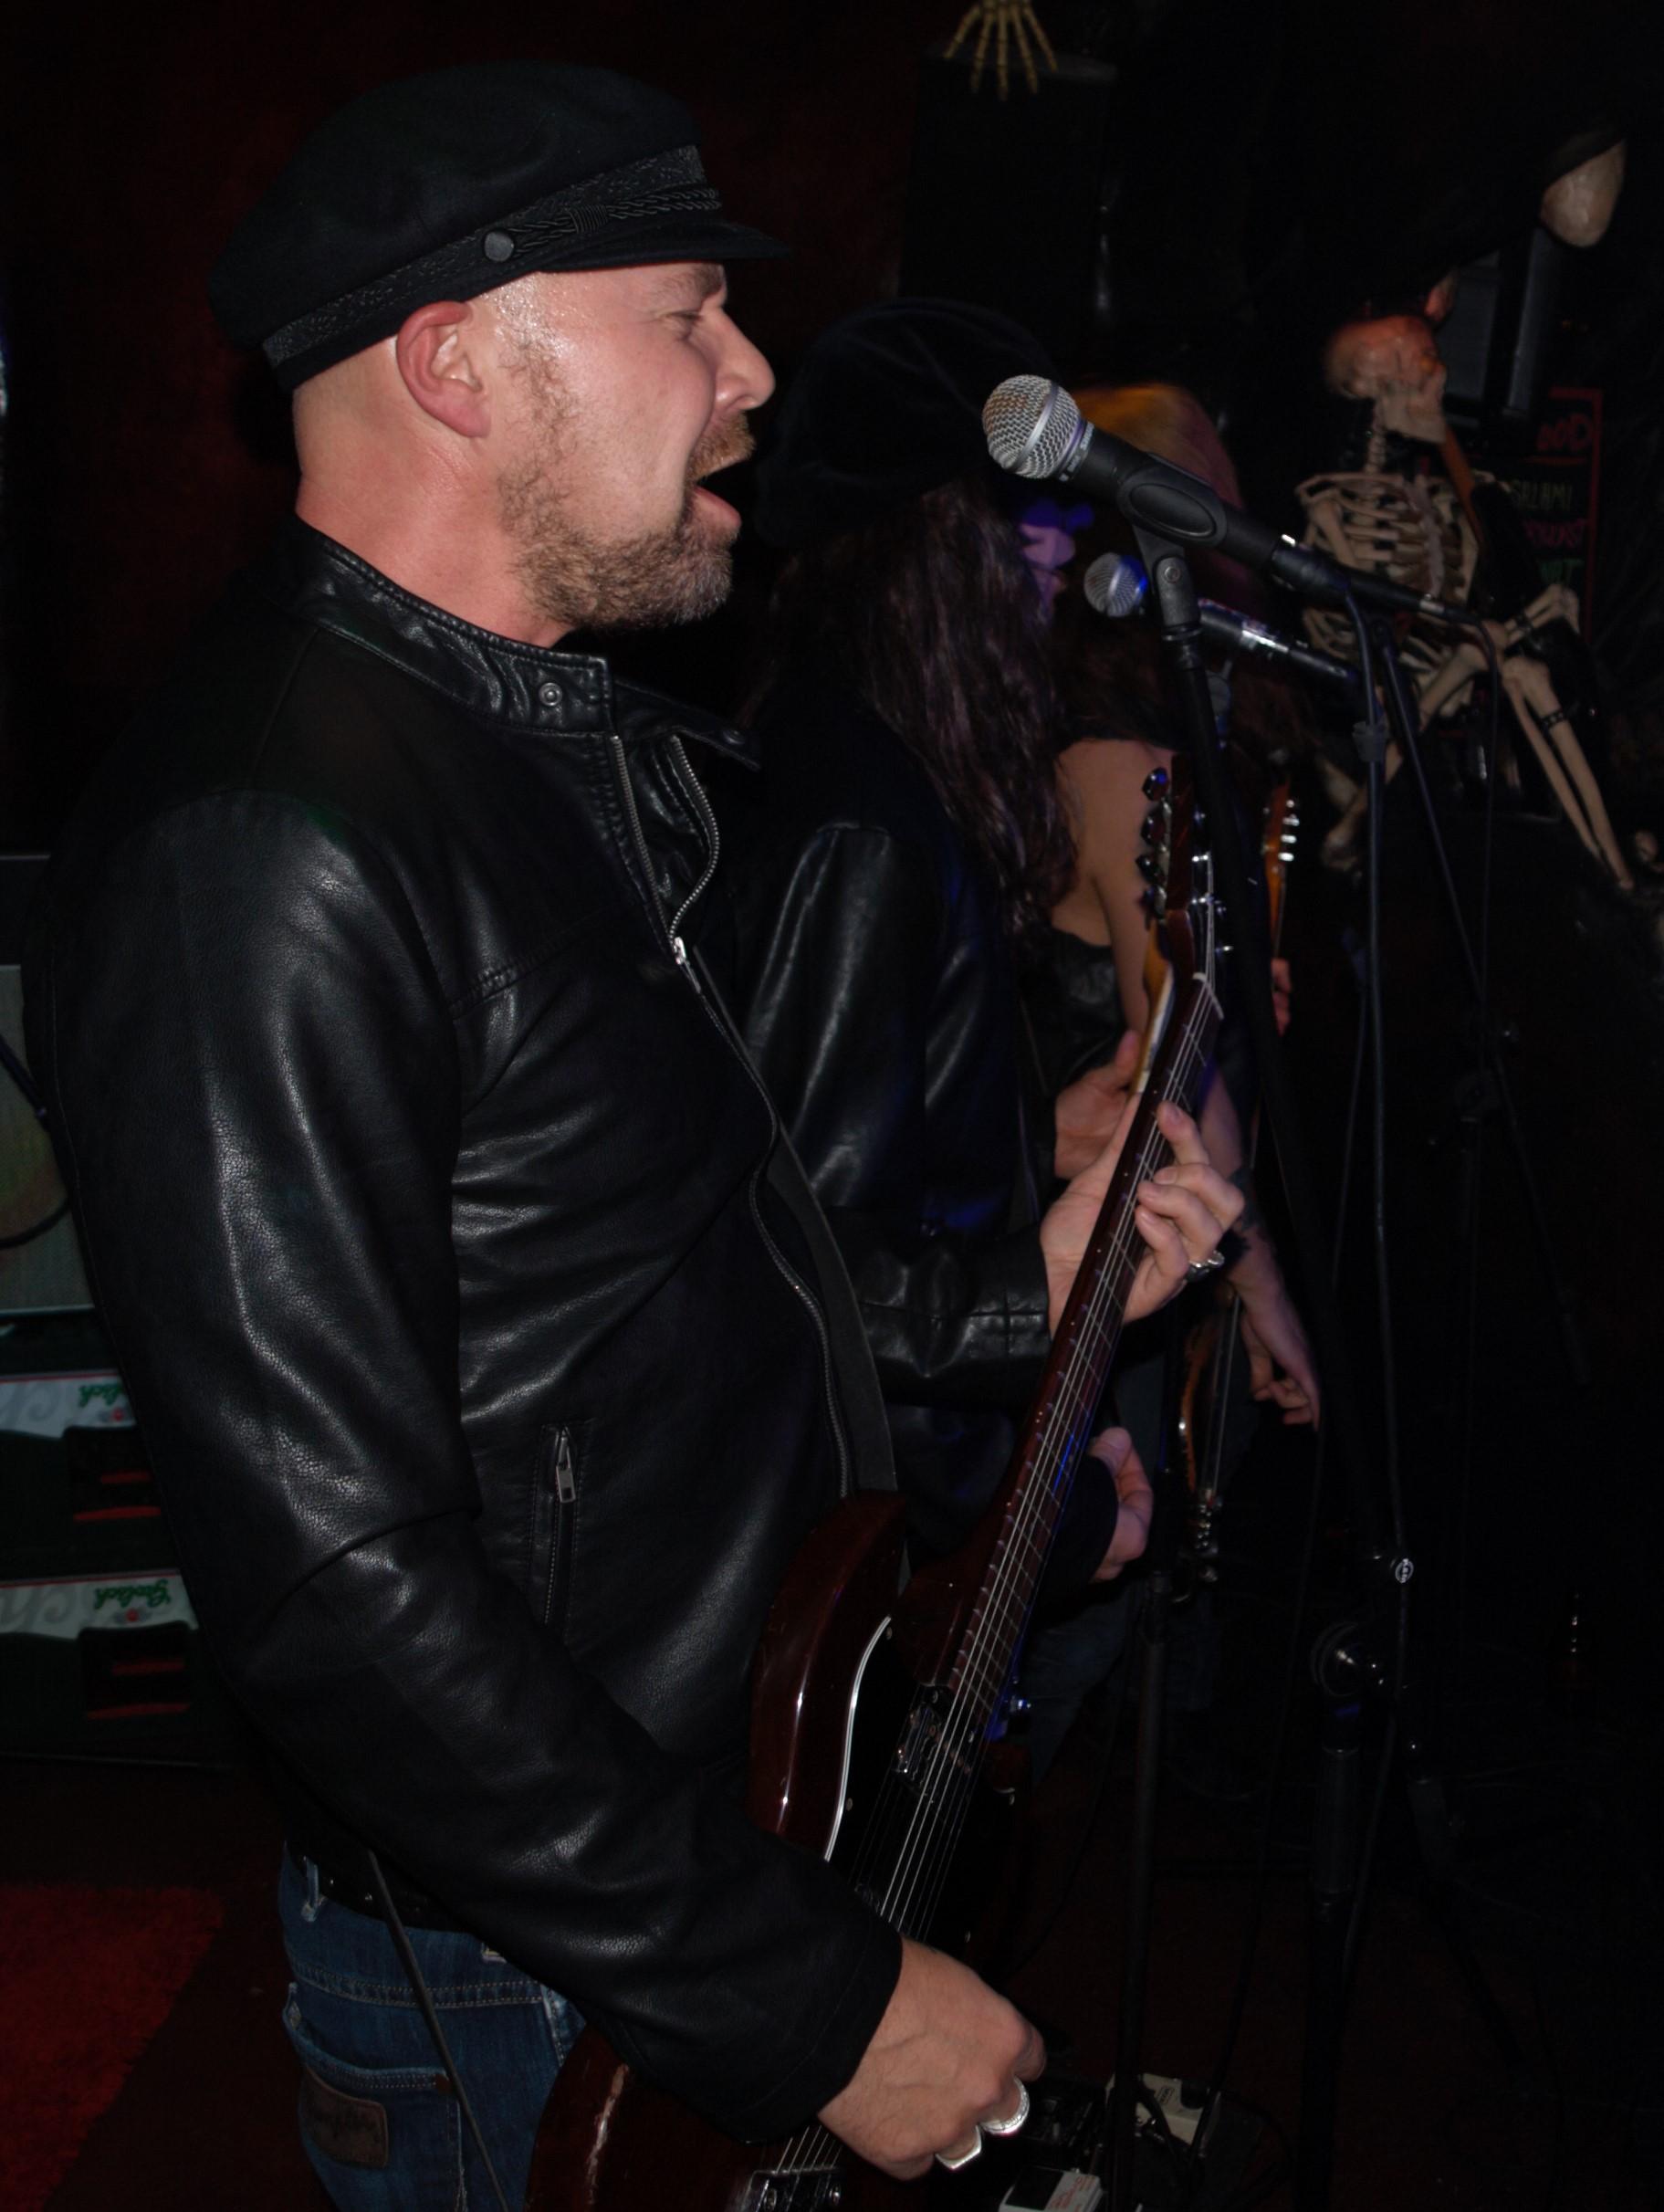 Gitarrist Packe liefert die Backings bei der Hit-Single 'Saturday Night, Tonight We Gonna Have Some Fun'.